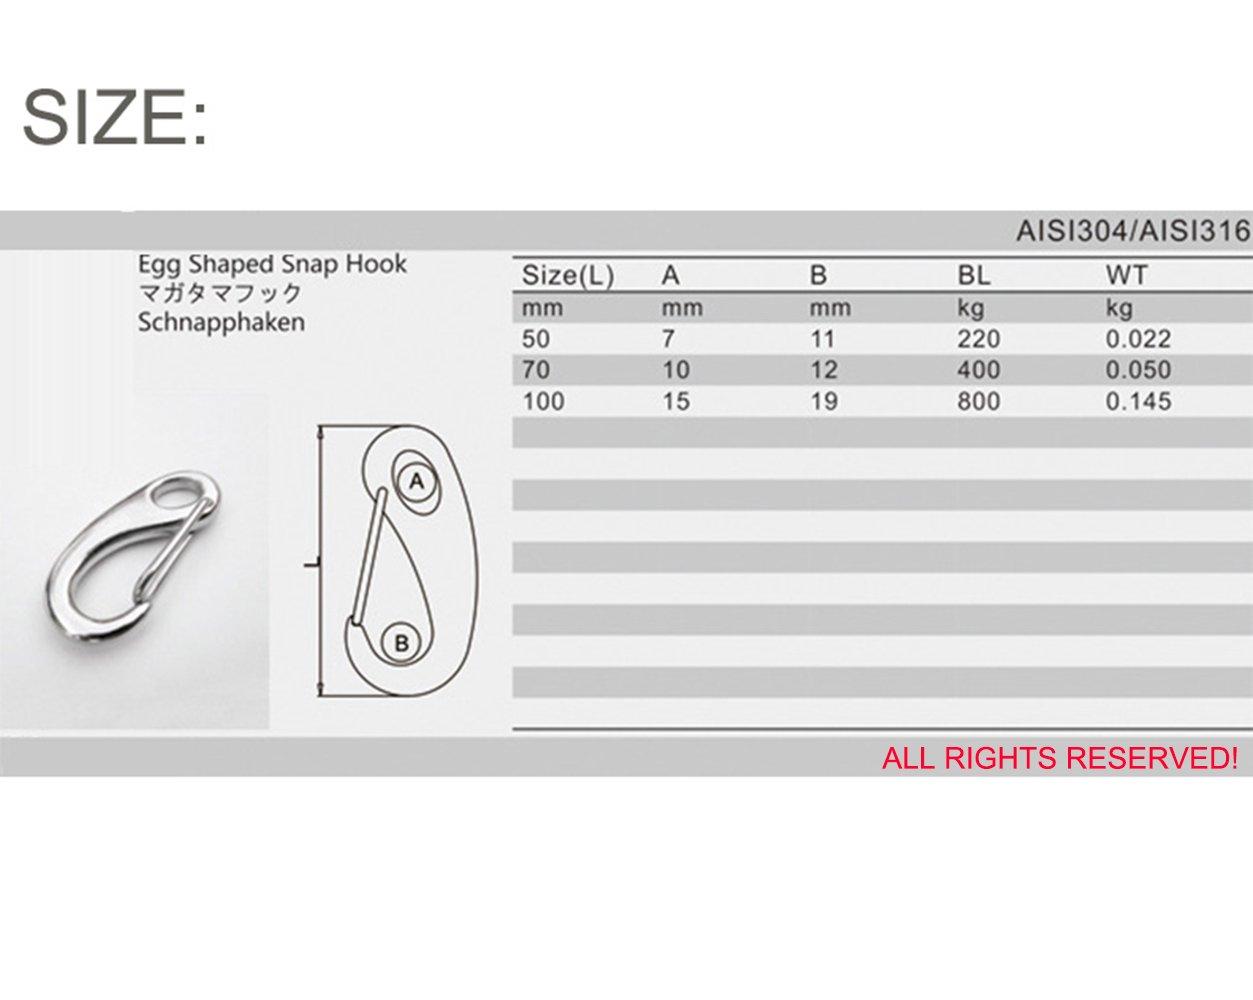 2.8 Inch Length 304 Stainless Steel Egg Shaped Snap Hook Carabiner 5-PACK